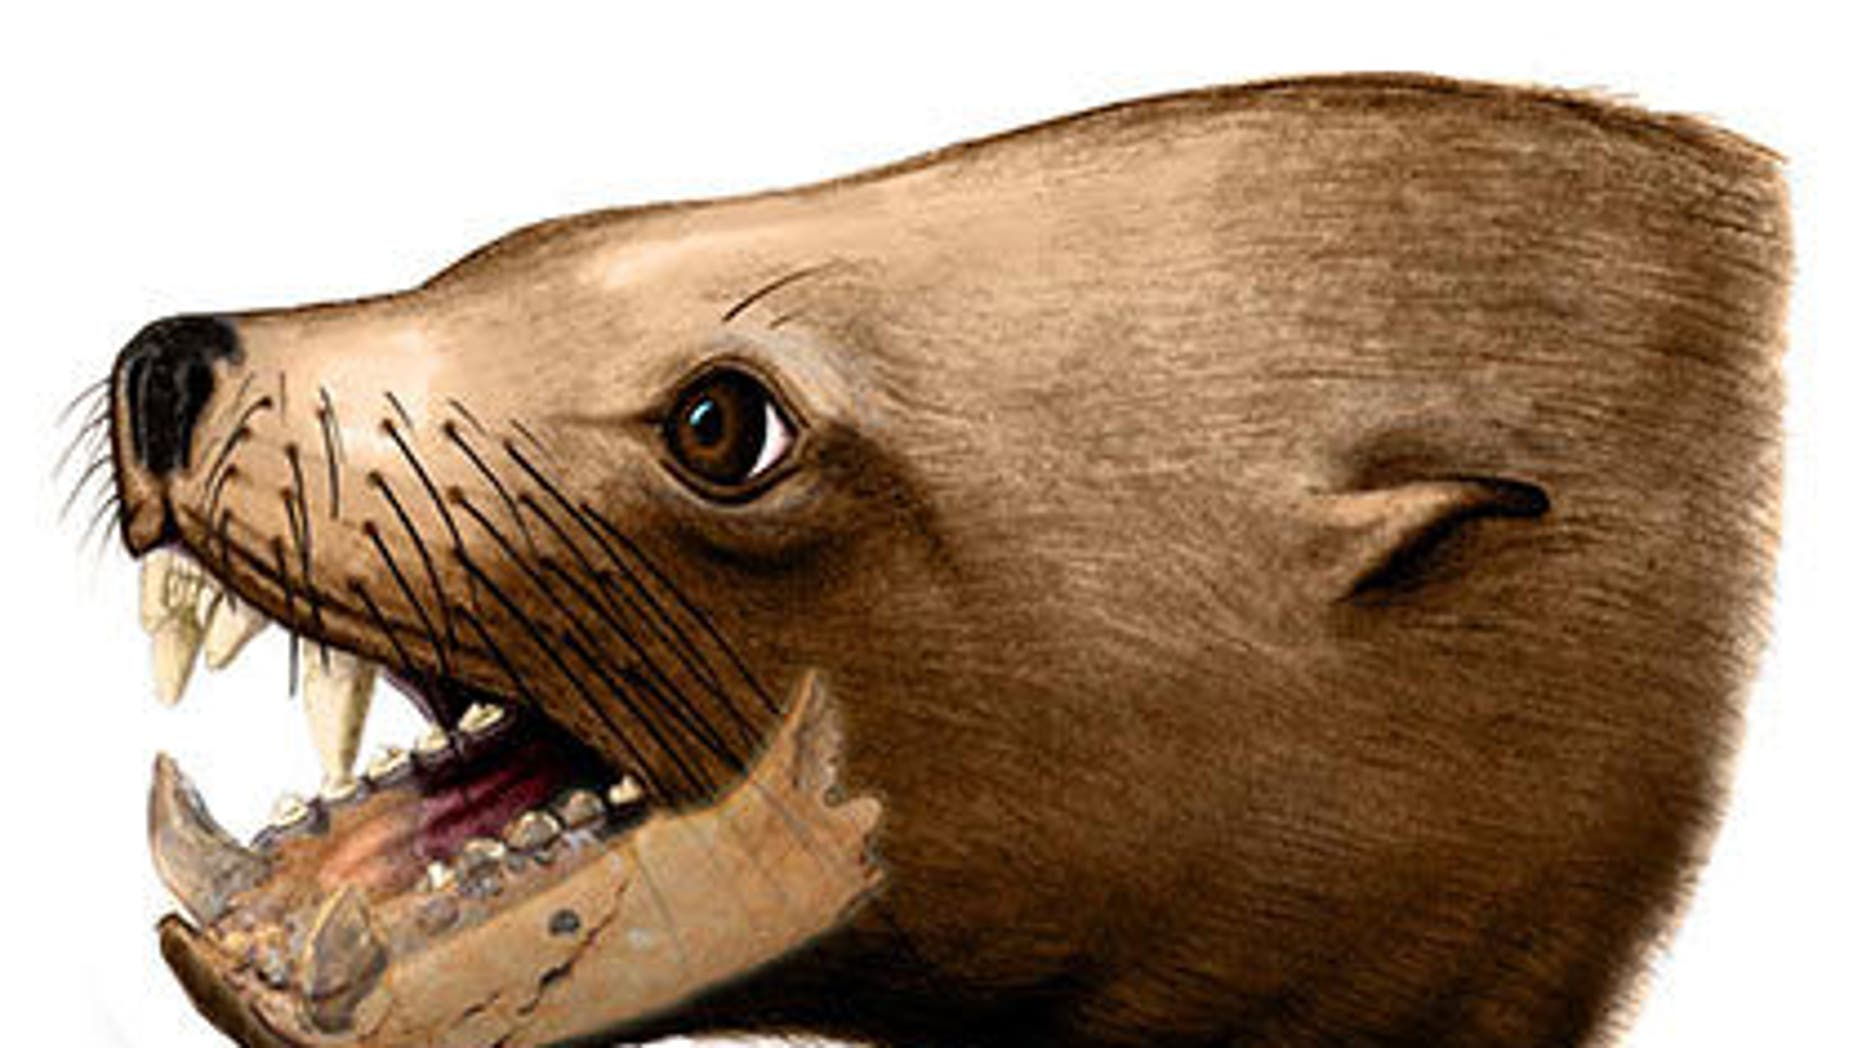 An artist's rendition of the extinct walrus, Pelagiarctos thomasi